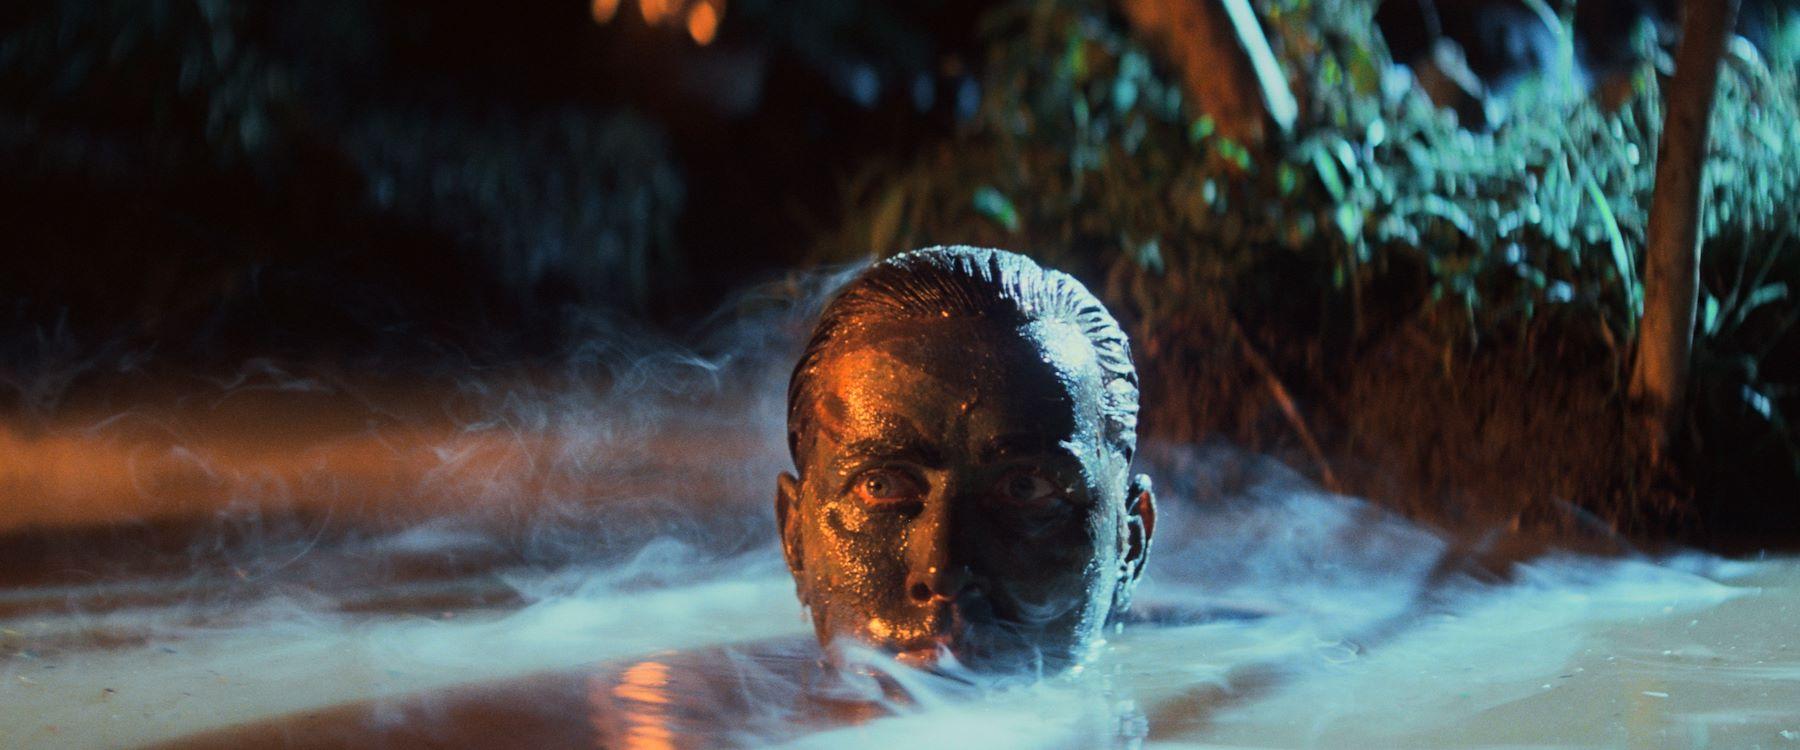 Zomerfilmhuis: Apocalypse Now: Final Cut